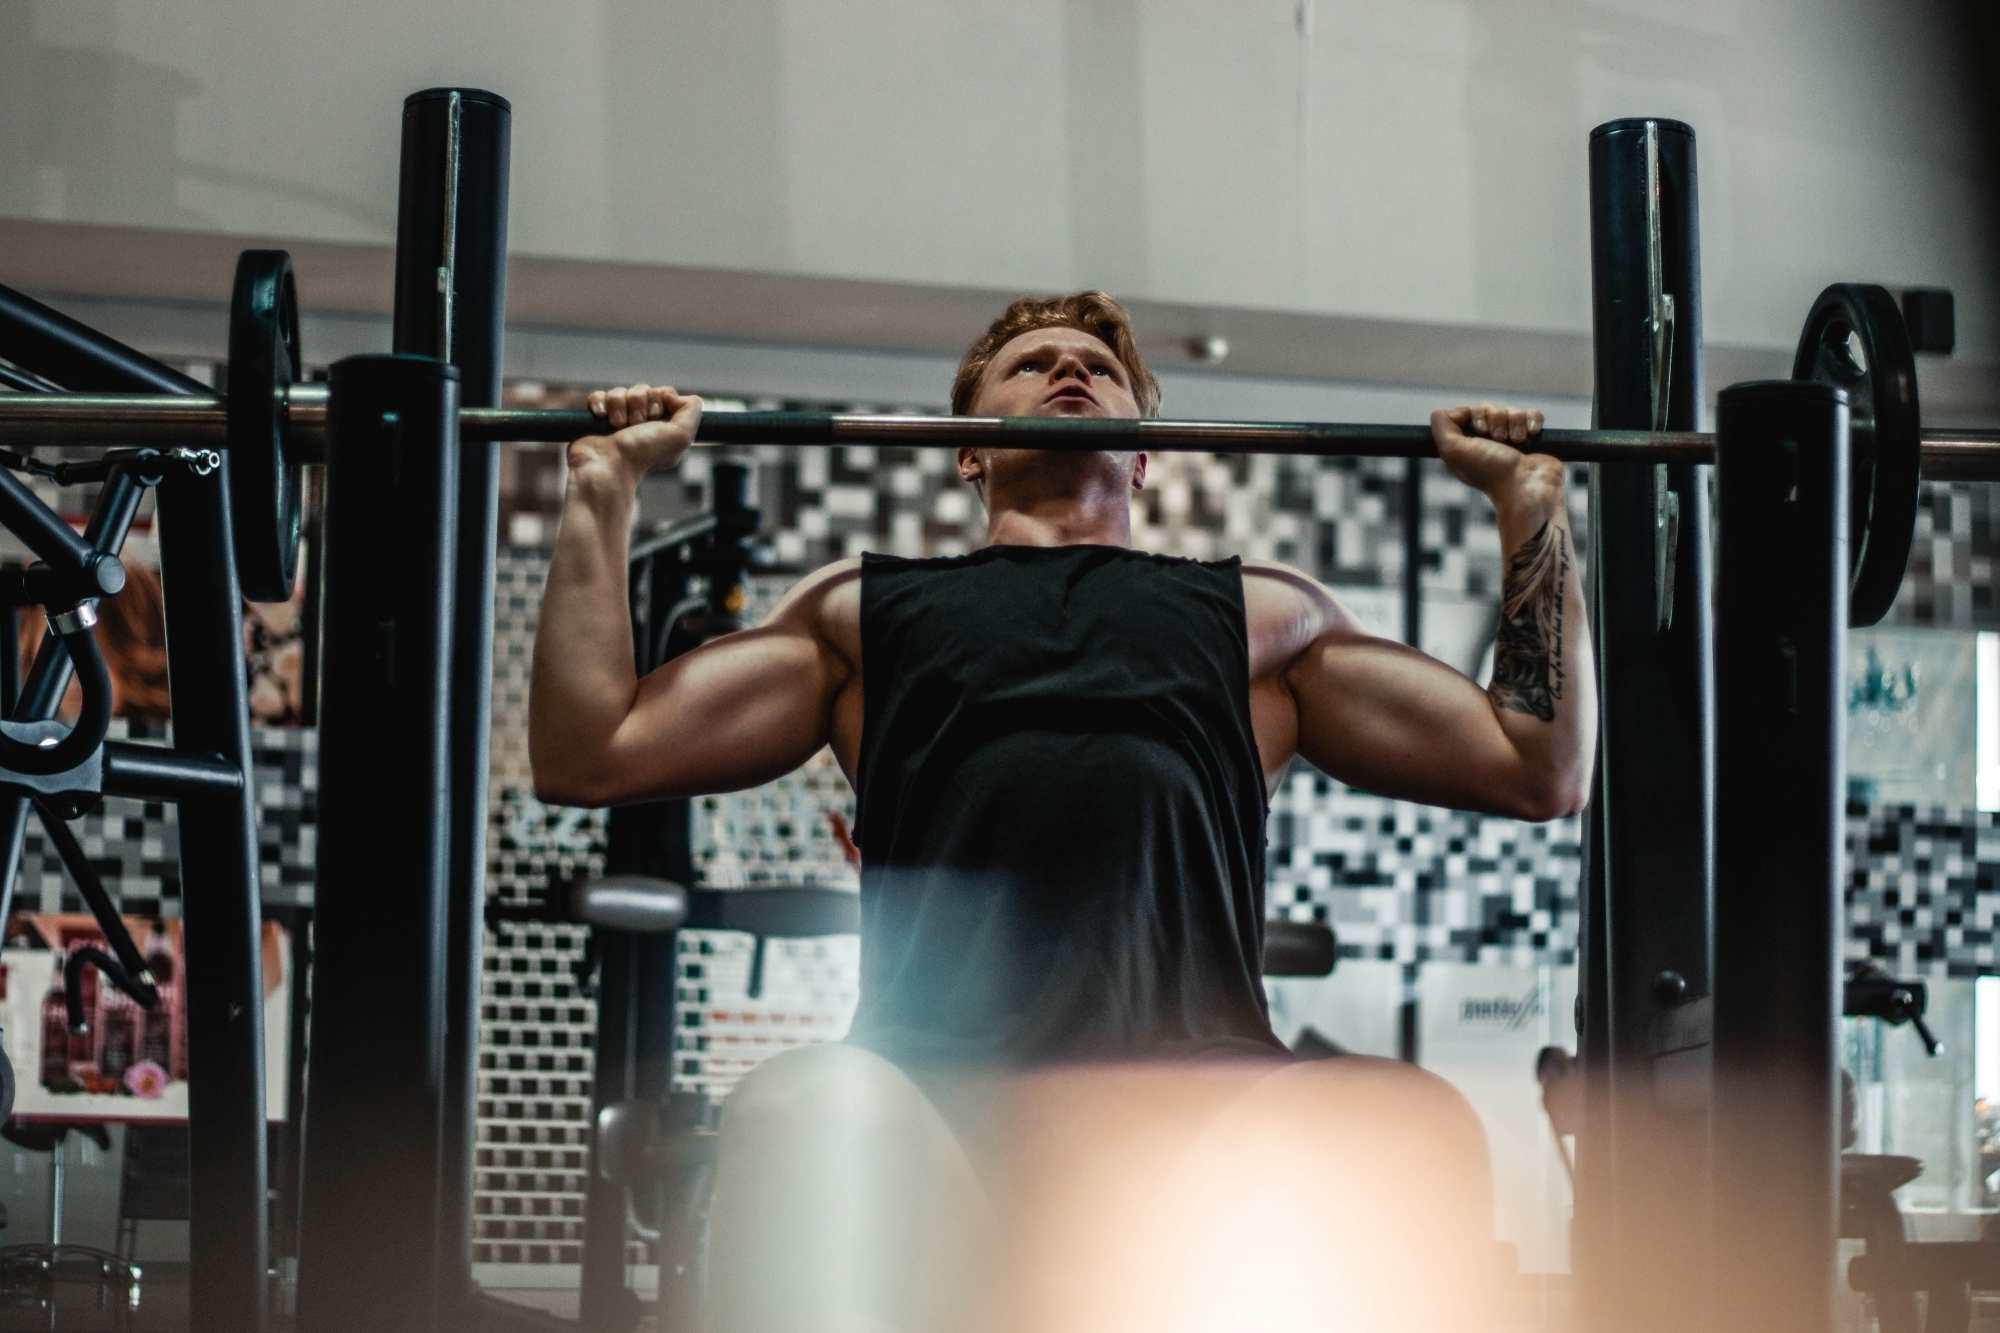 steroids may affect male fertility